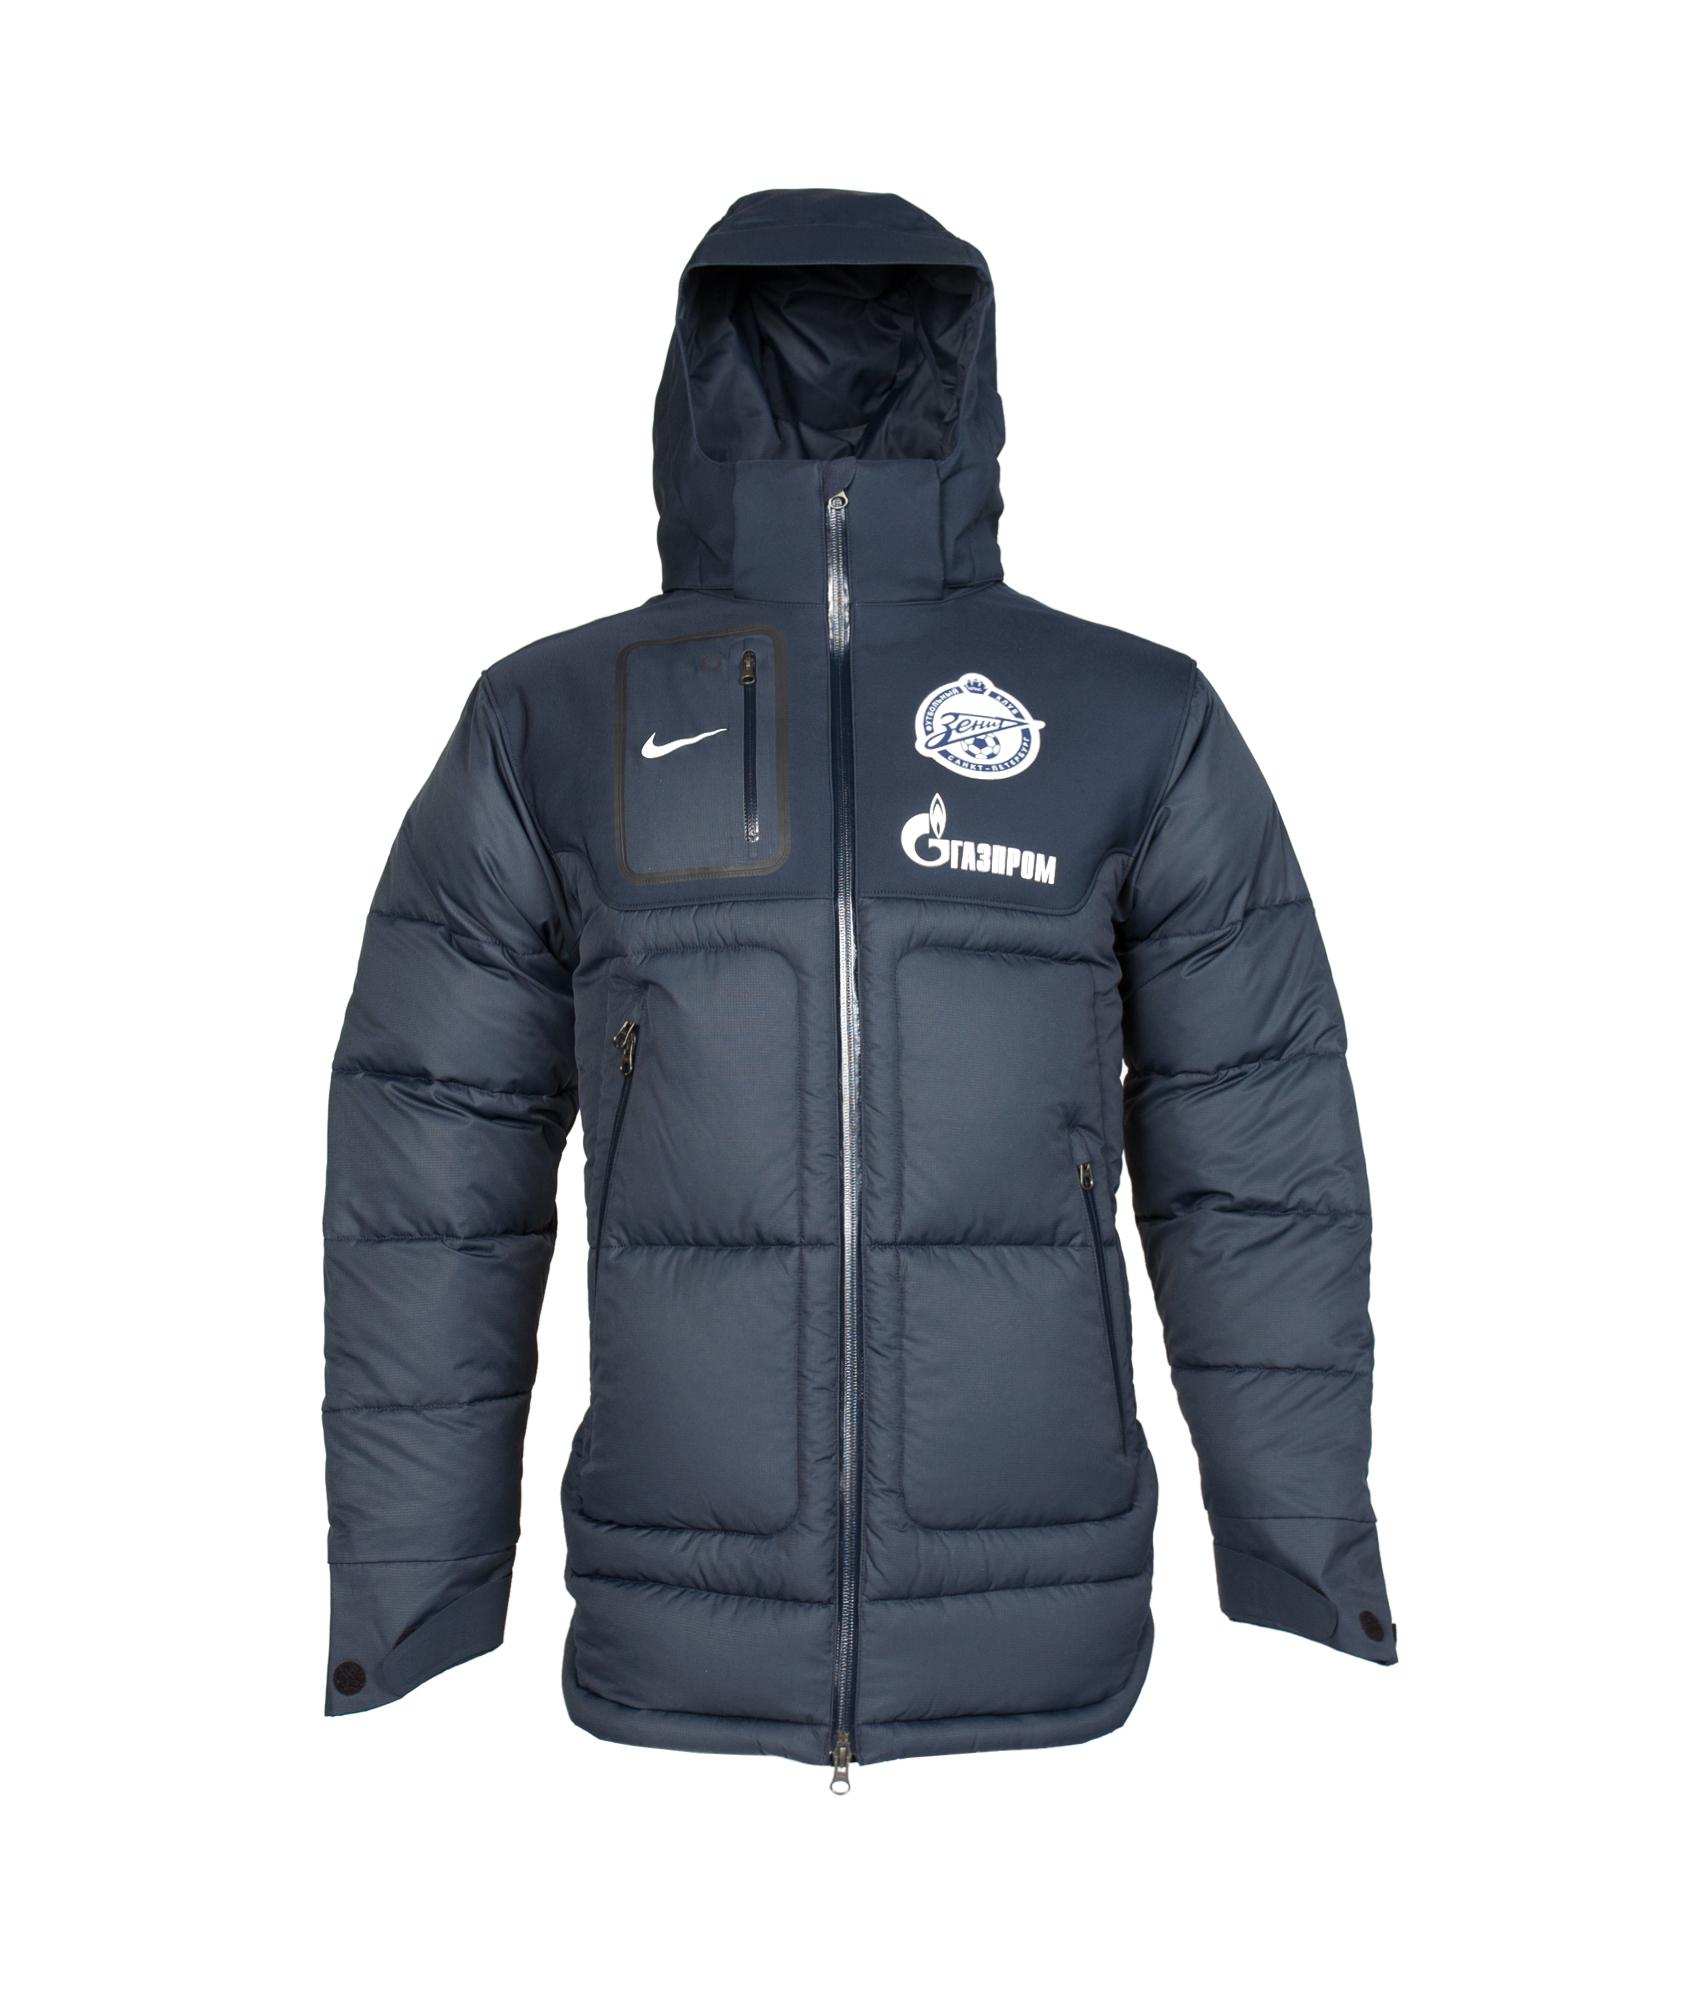 Куртка Nike Nike Цвет-Темно-Синий